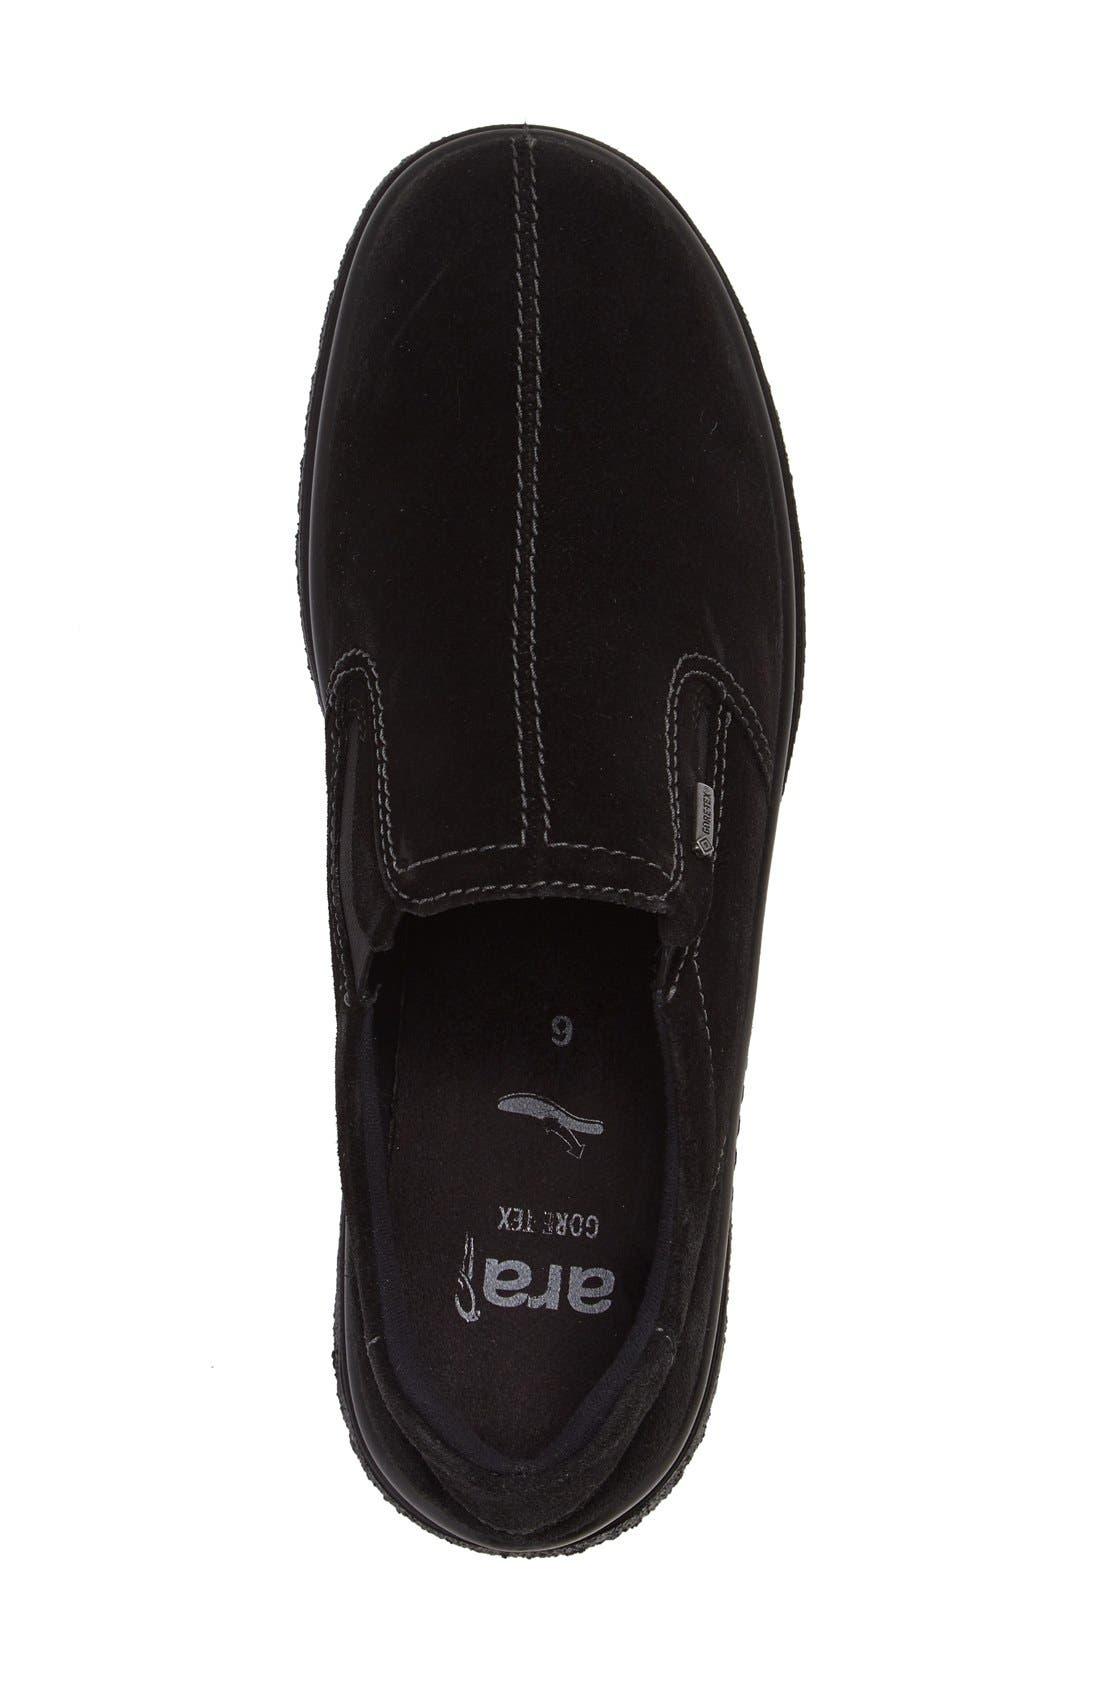 Parson Waterproof Gore-Tex<sup>®</sup> Slip-On Sneaker,                             Alternate thumbnail 7, color,                             001